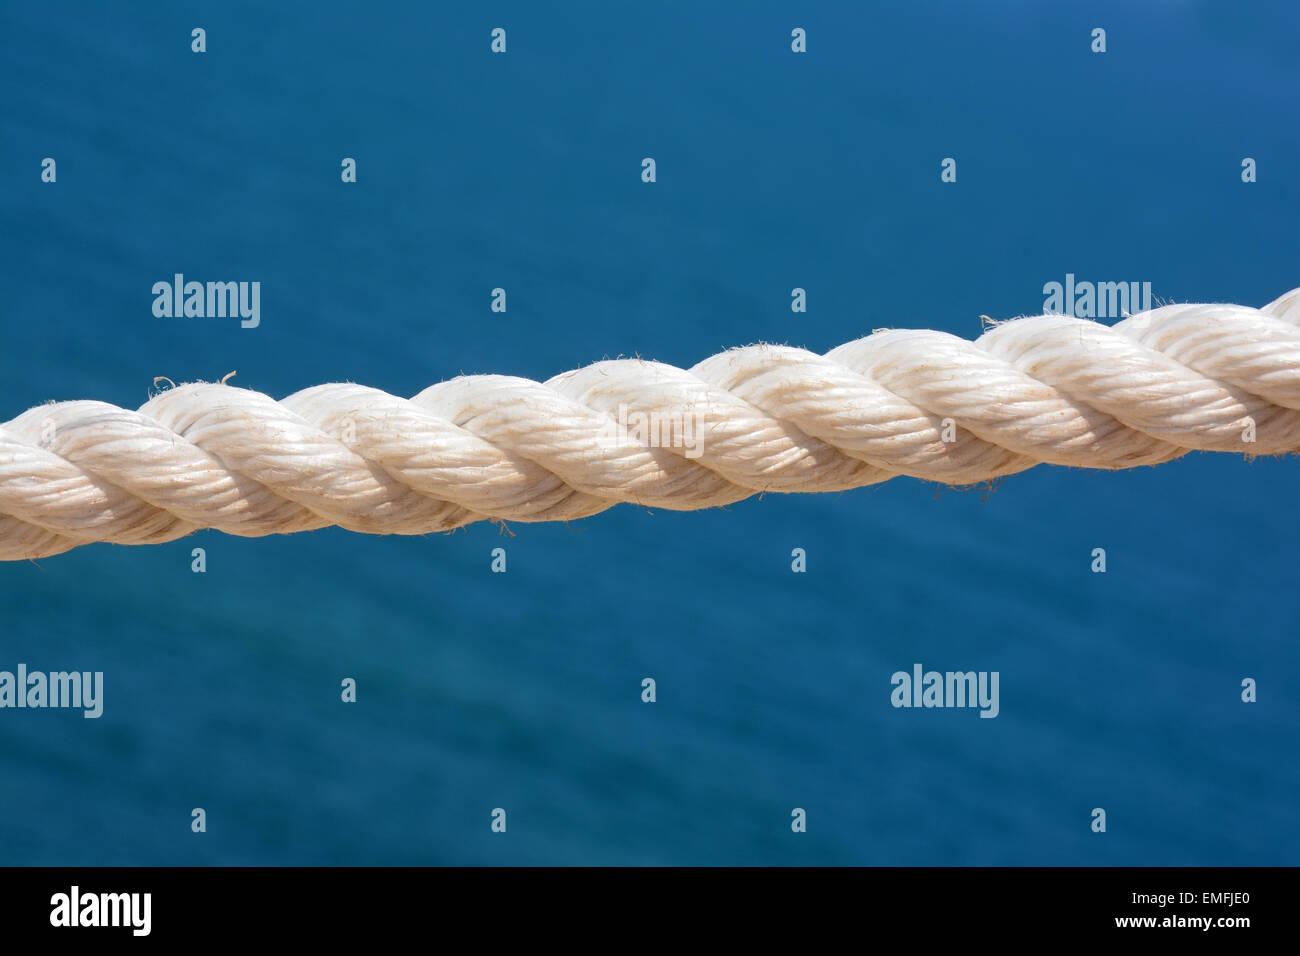 Cuerda blanca Imagen De Stock